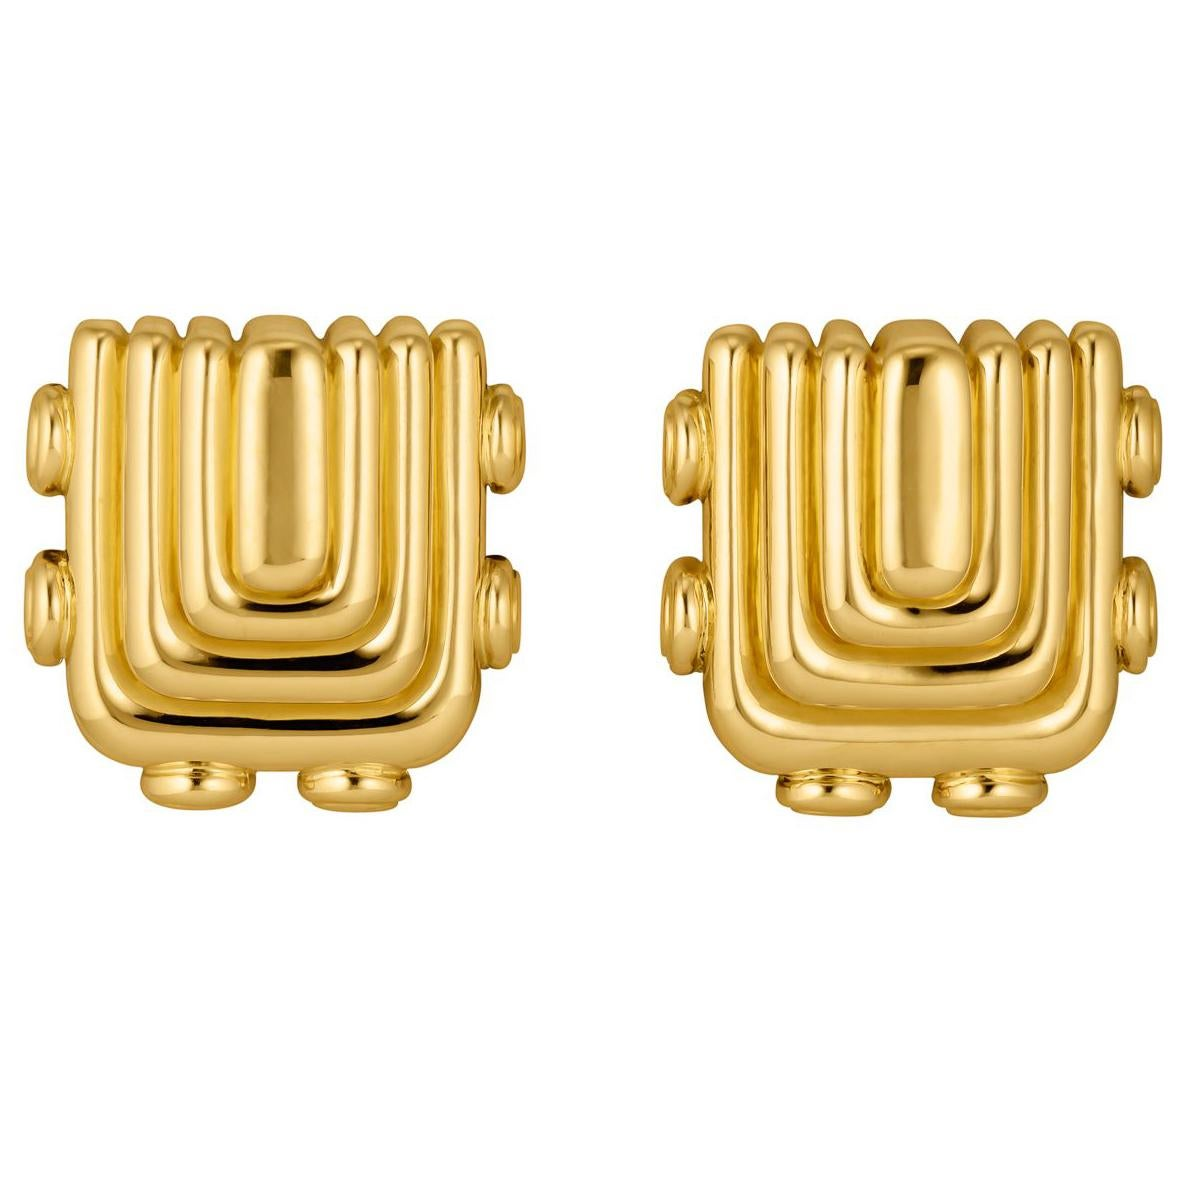 Vintage Cartier Aldo Cipullo Gold Earrings